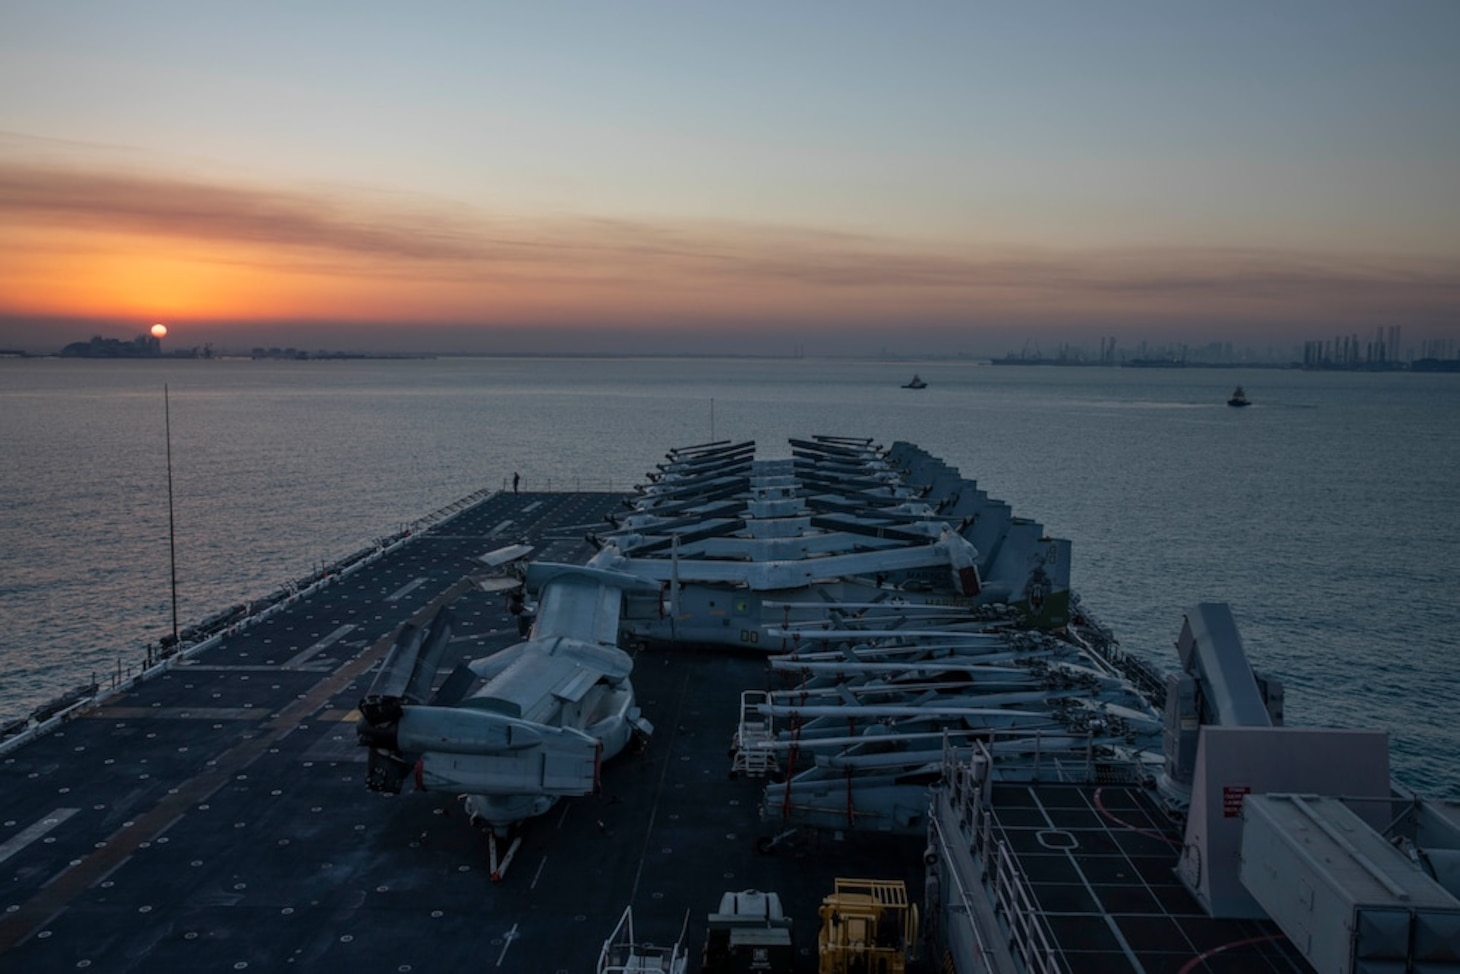 USS Makin Island Conducts Port Visit in Bahrain